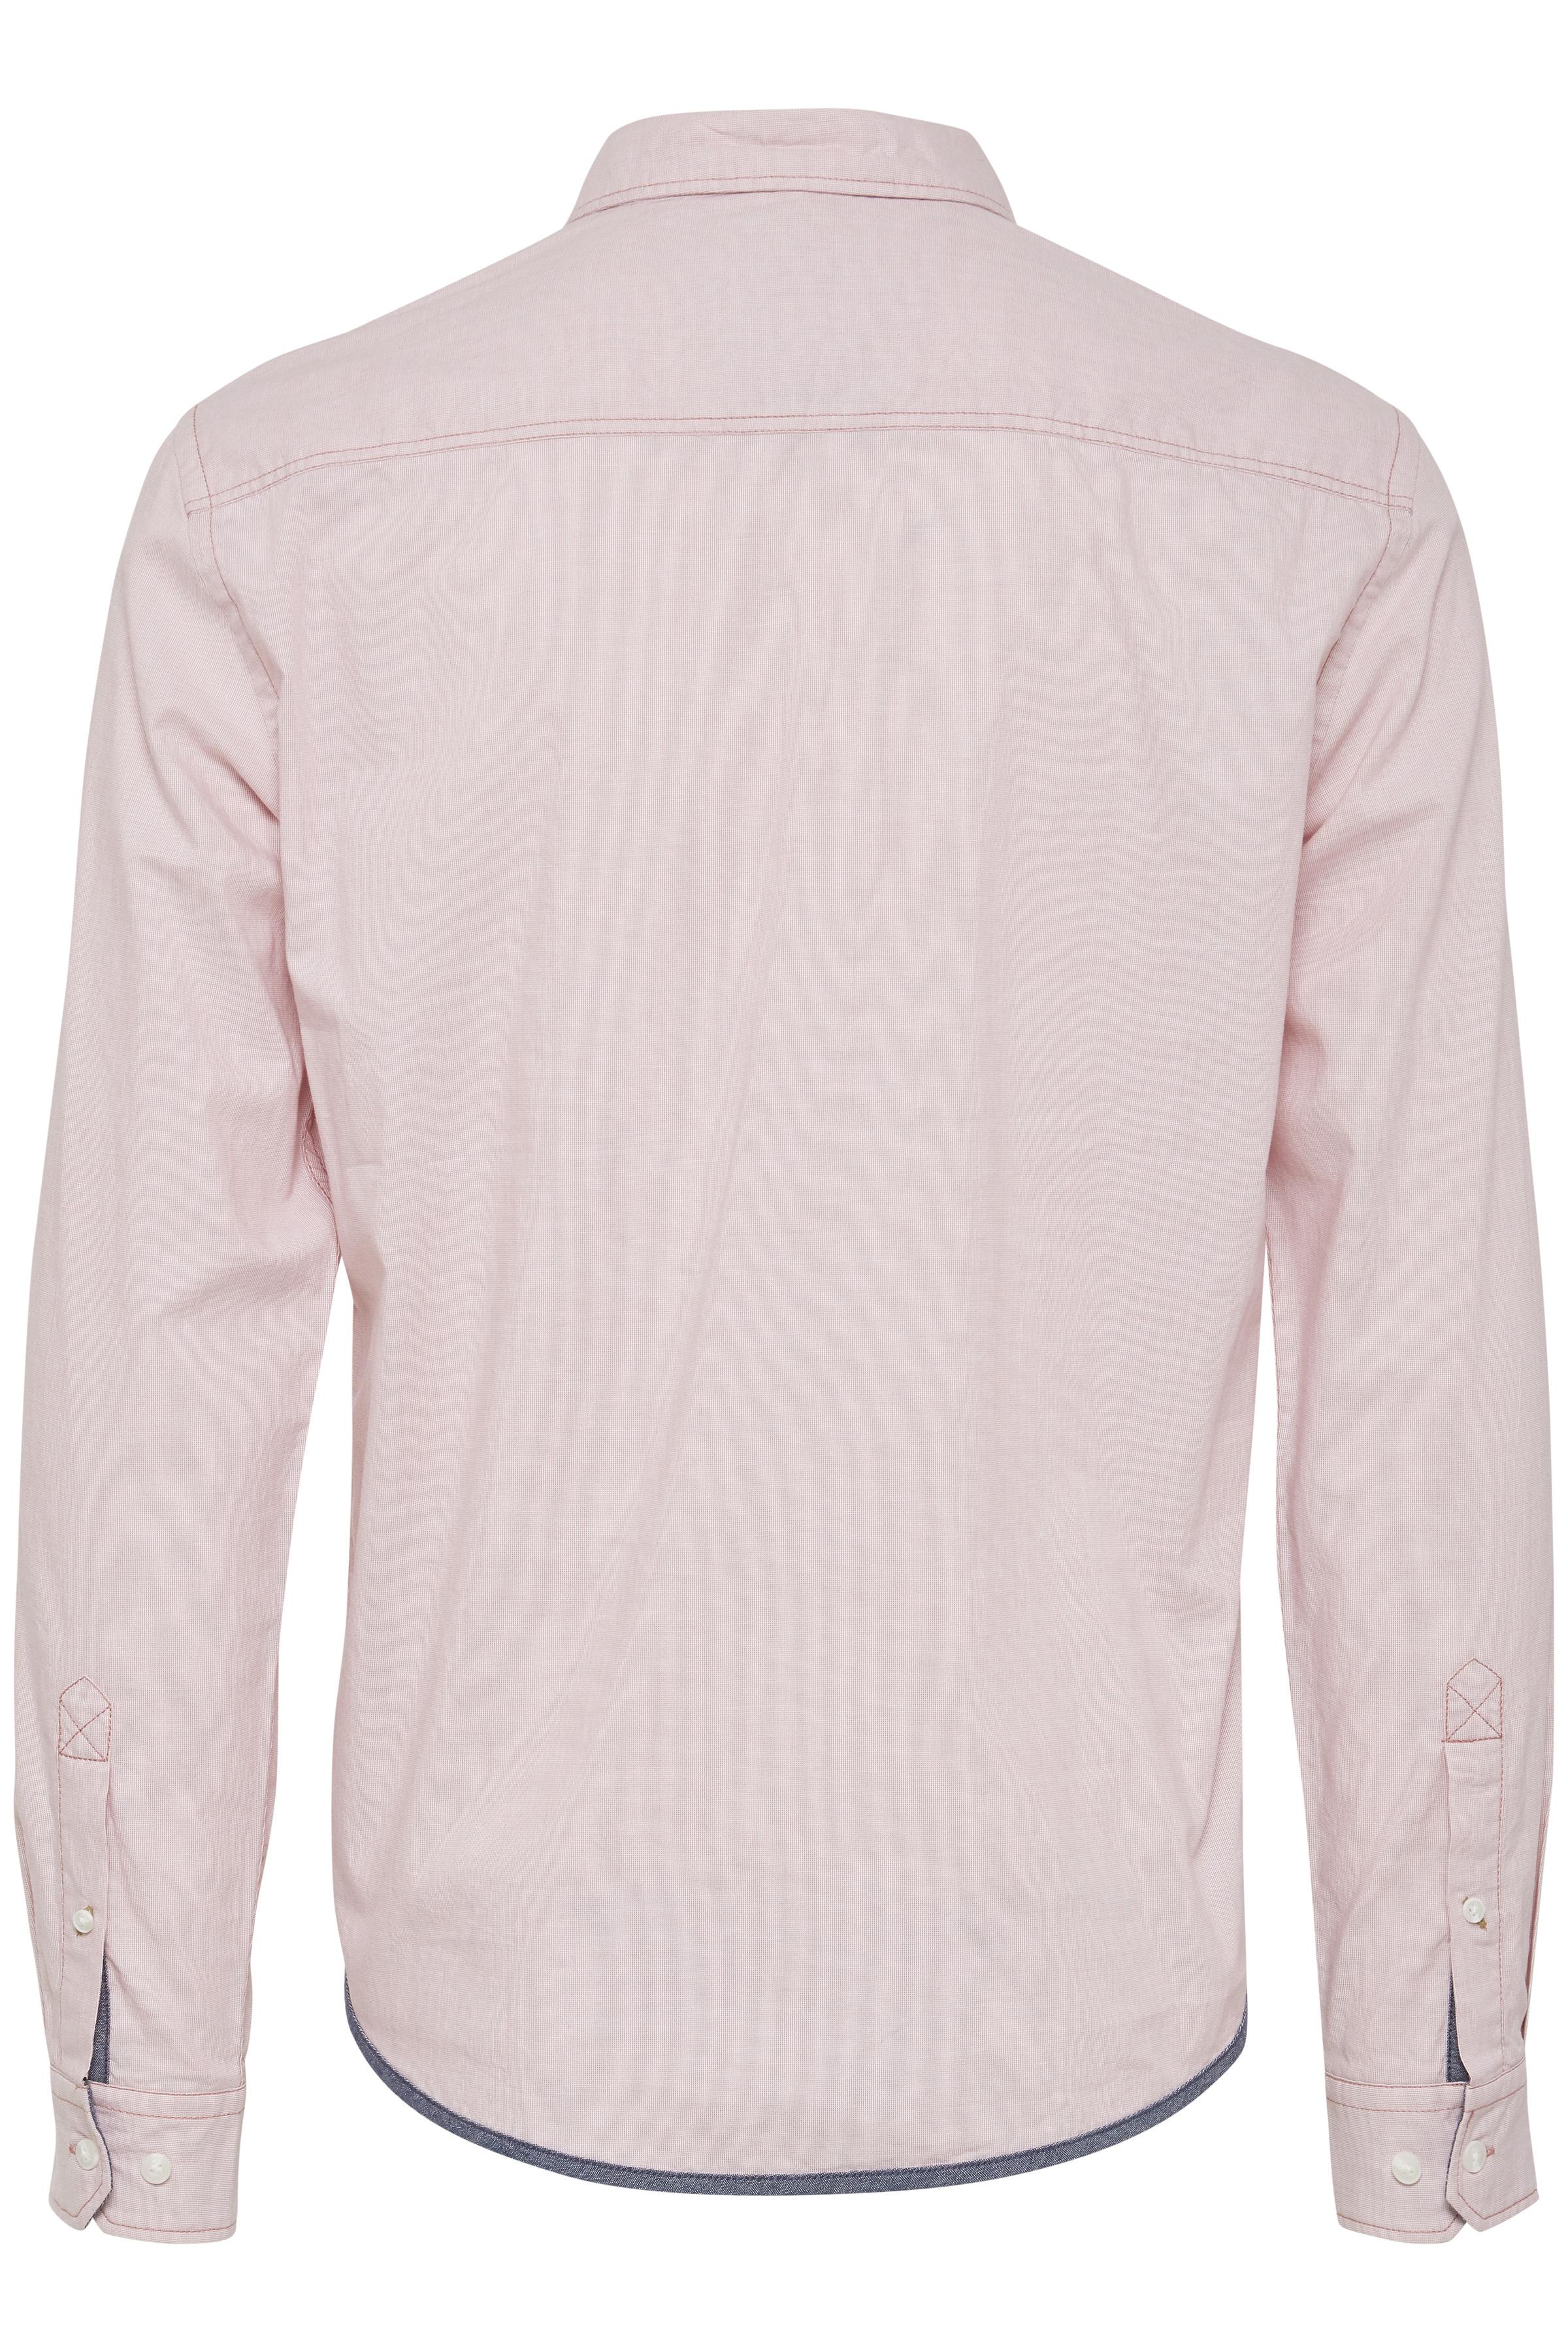 Dusty Rose red Long sleeved shirt fra Blend He – Køb Dusty Rose red Long sleeved shirt fra str. M-XXL her